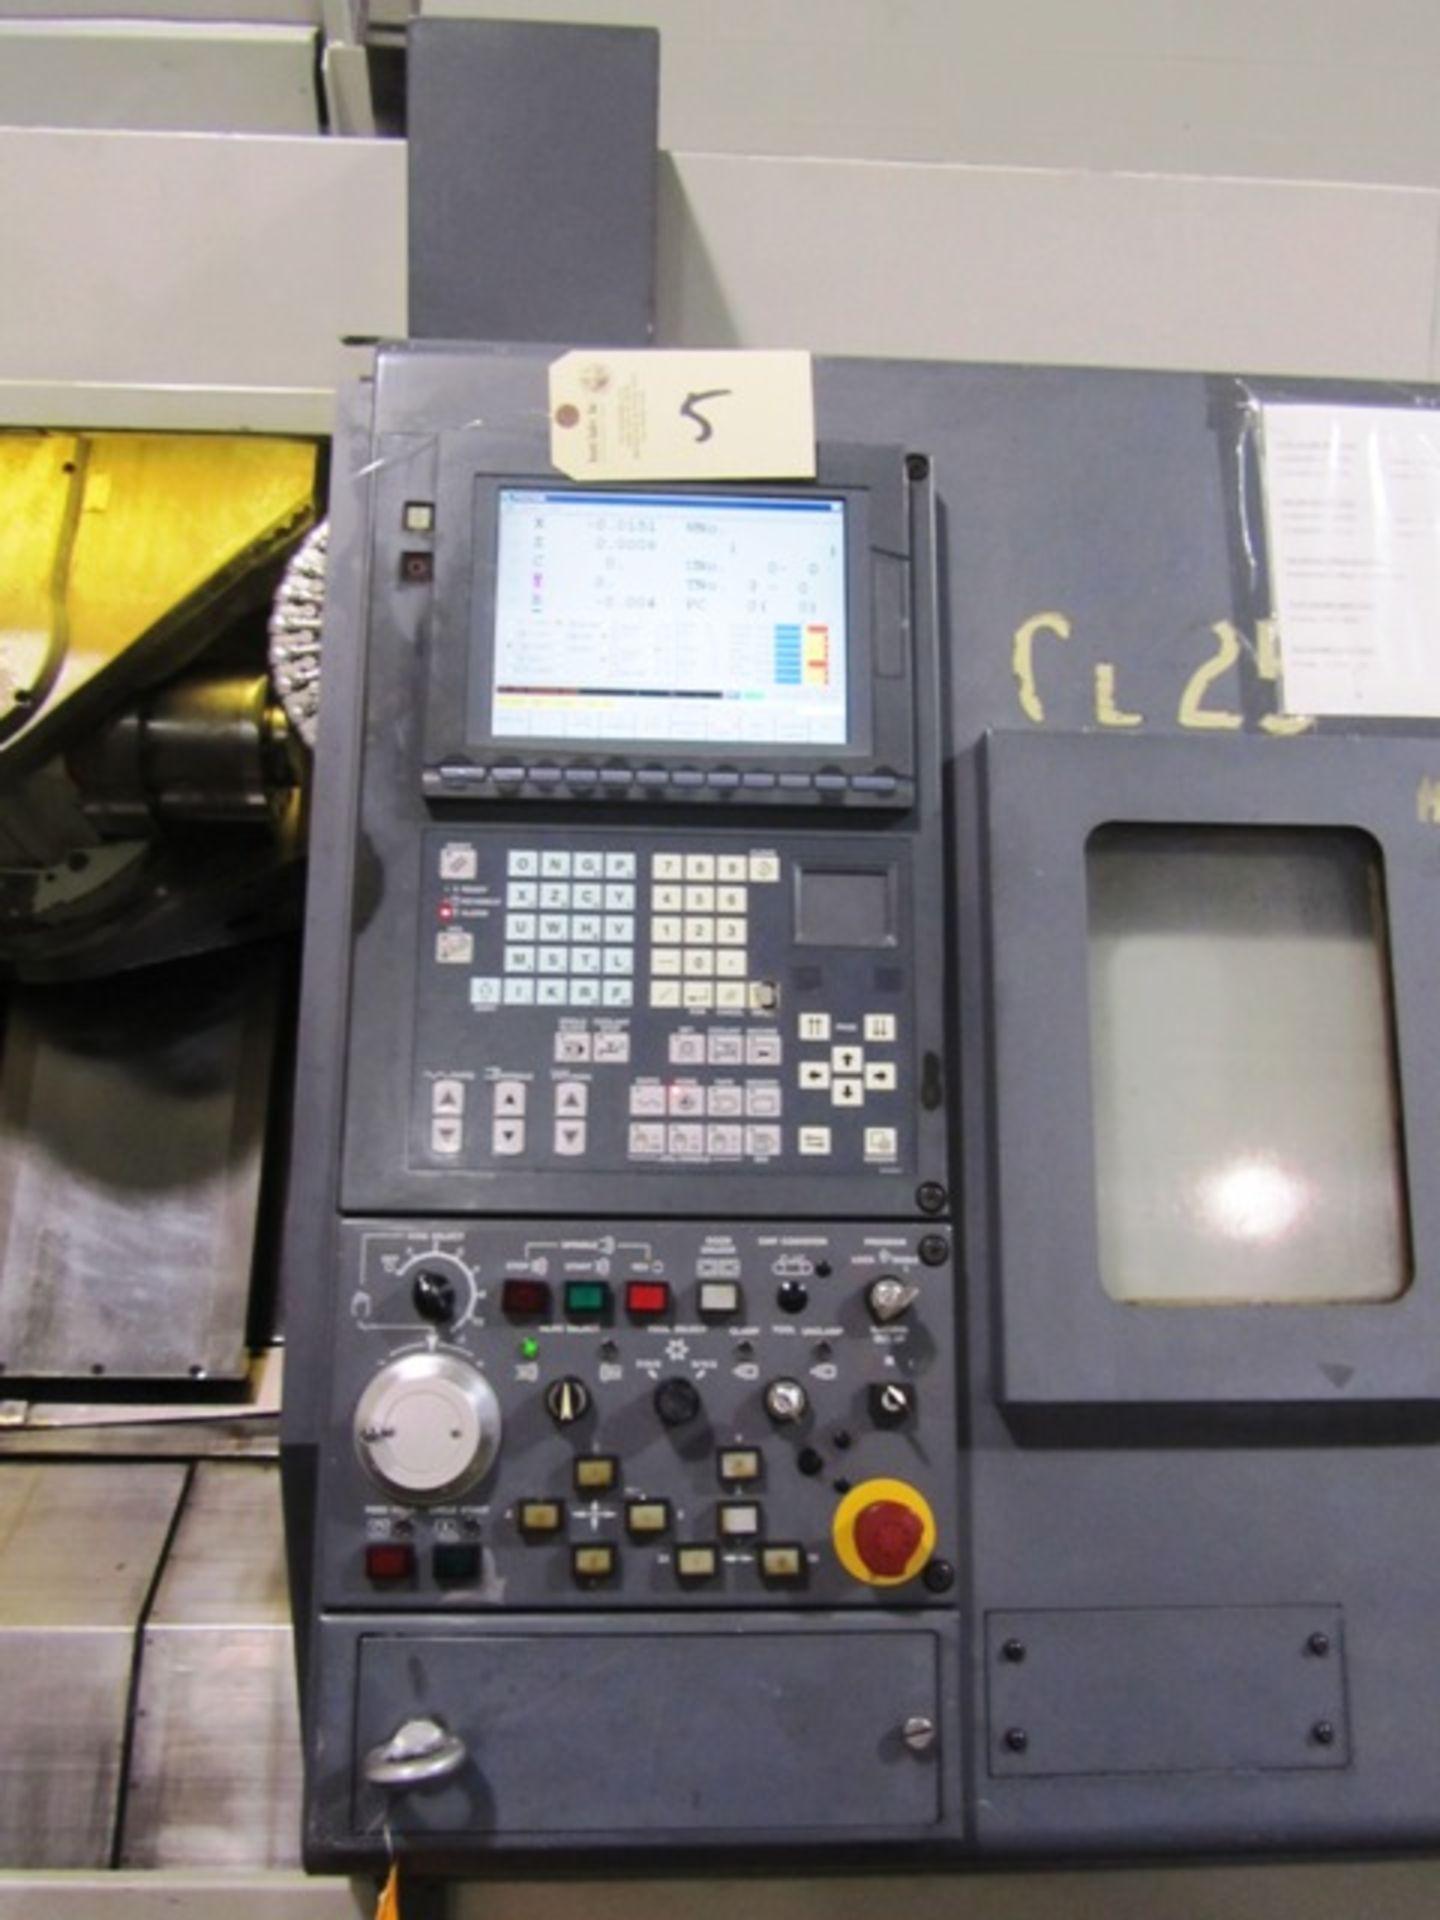 Lot 5 - Mazak Integrex 200SY CNC Multi-Tasking Turning & Milling Center